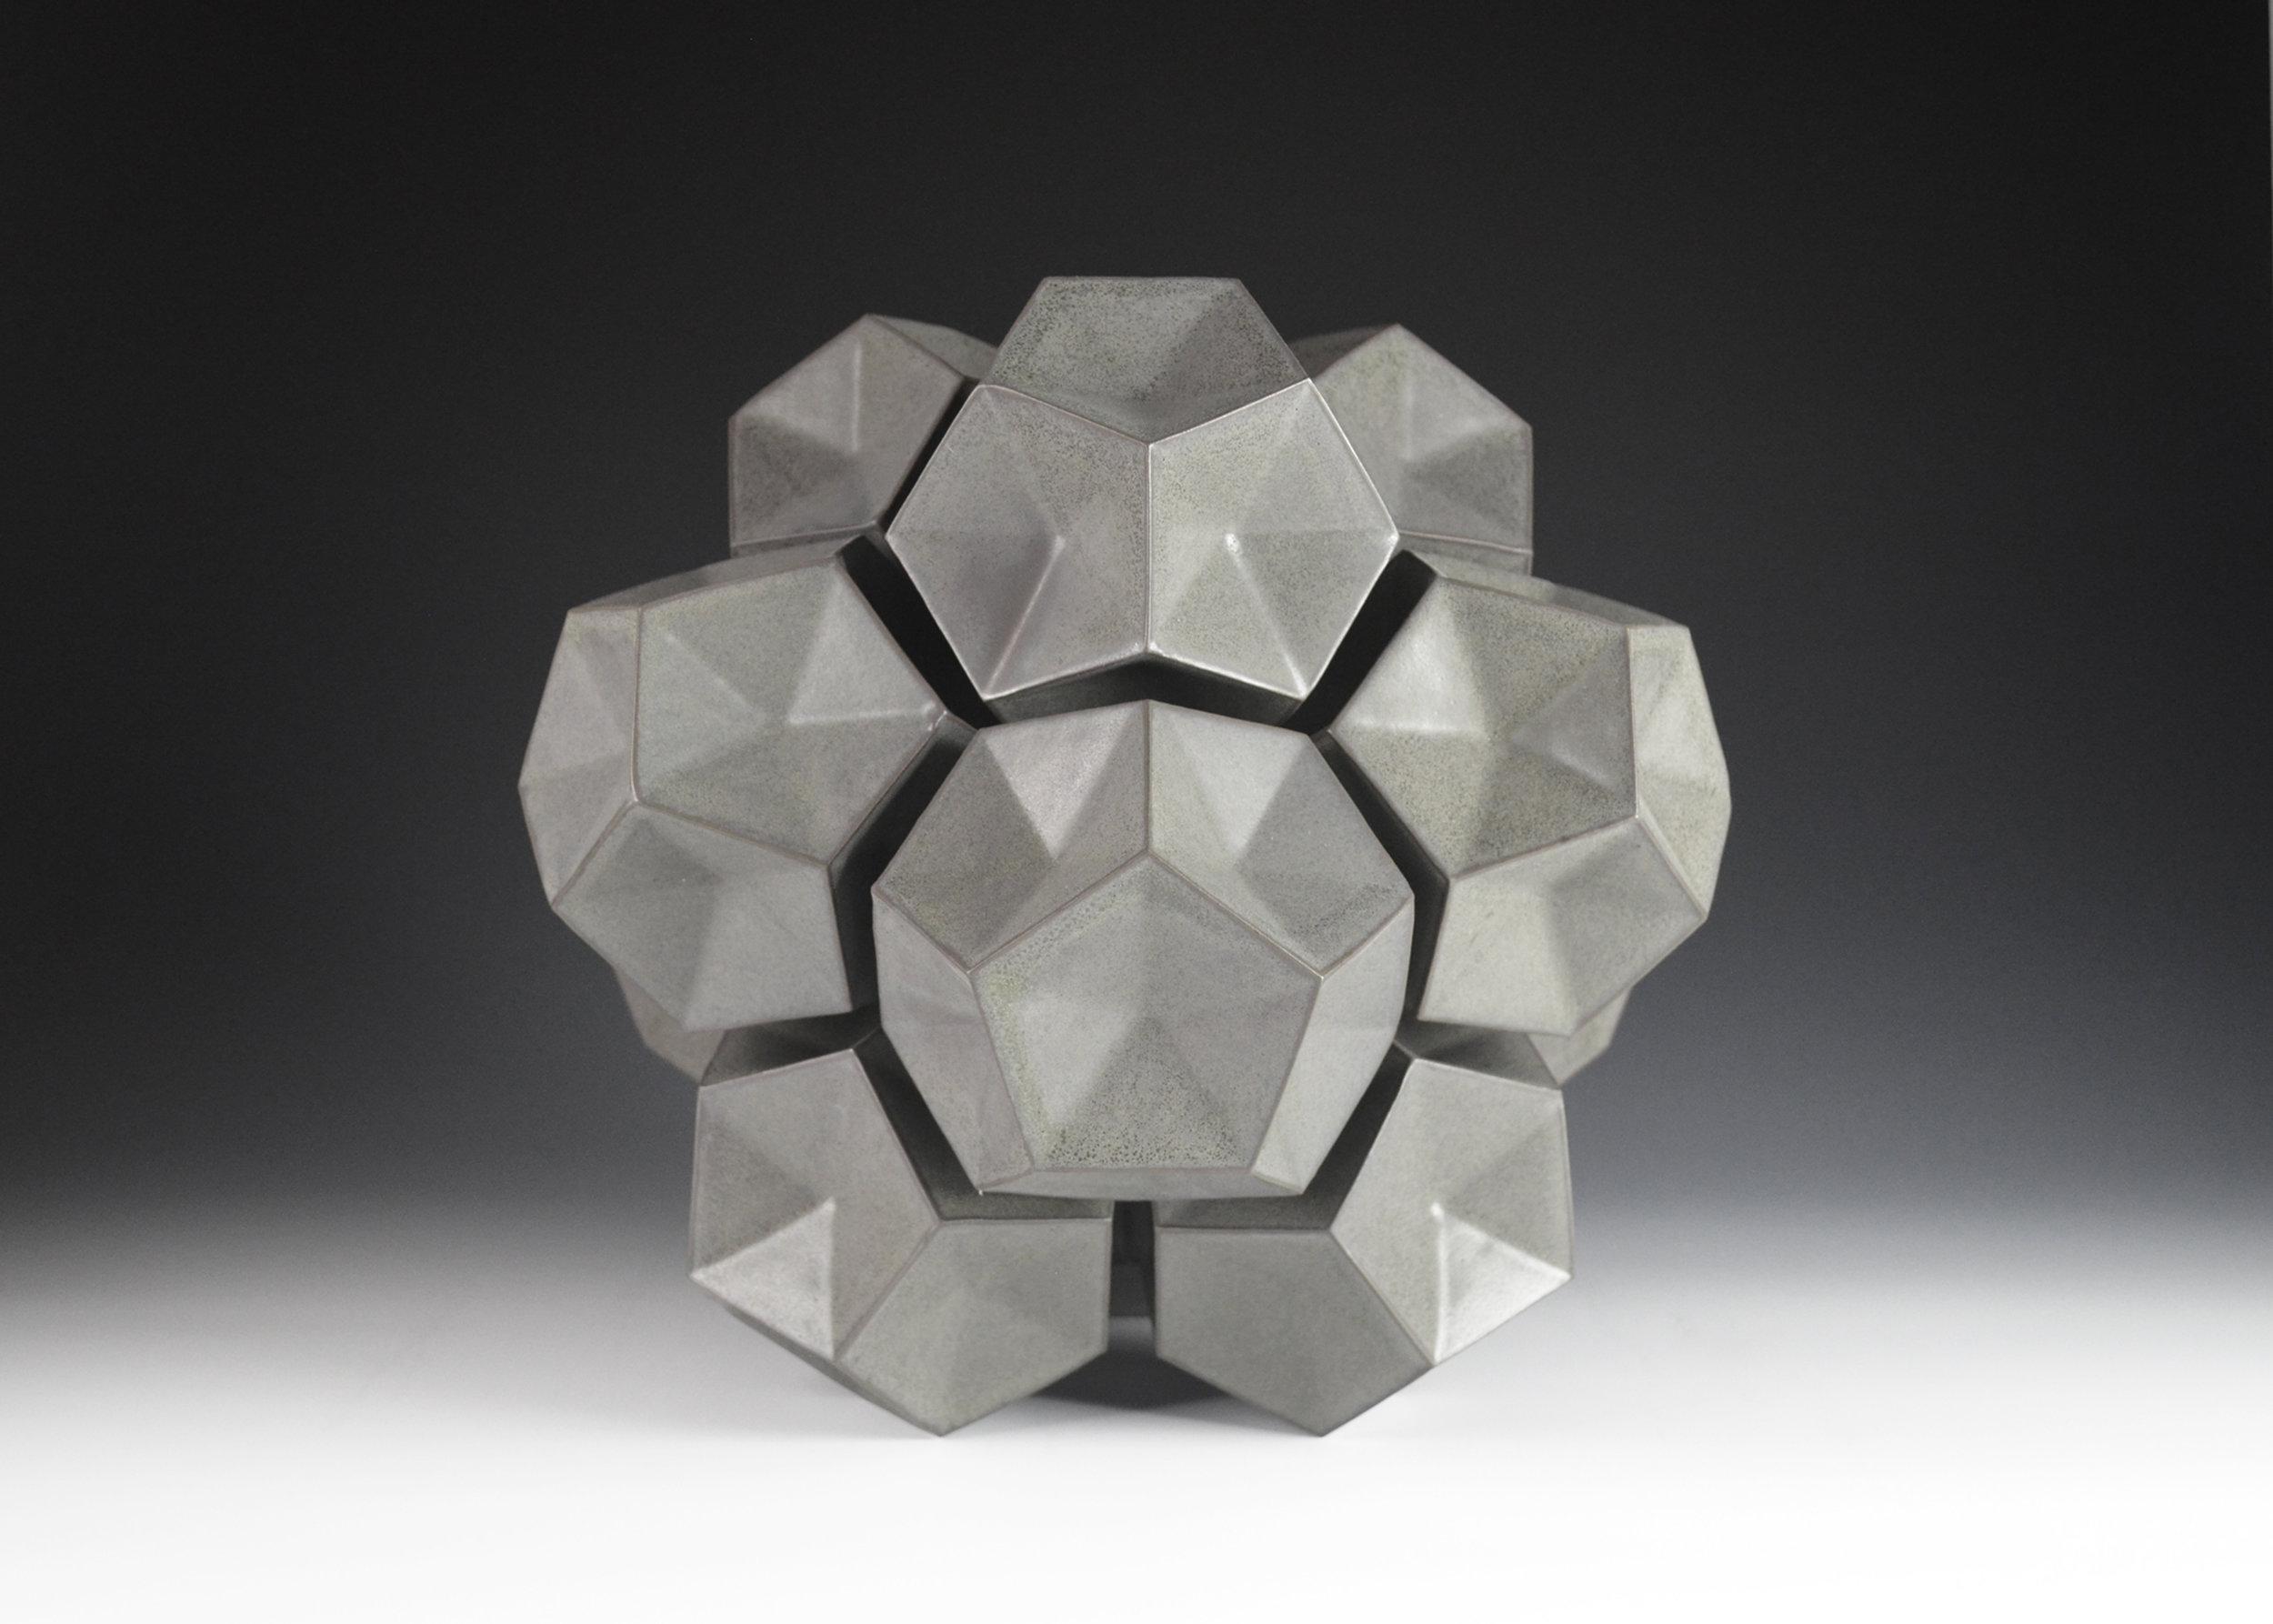 Dodecahedron Construction (Black)  |  14 x 14 x 14 inches  |  Porcelain, Glaze  |  2017